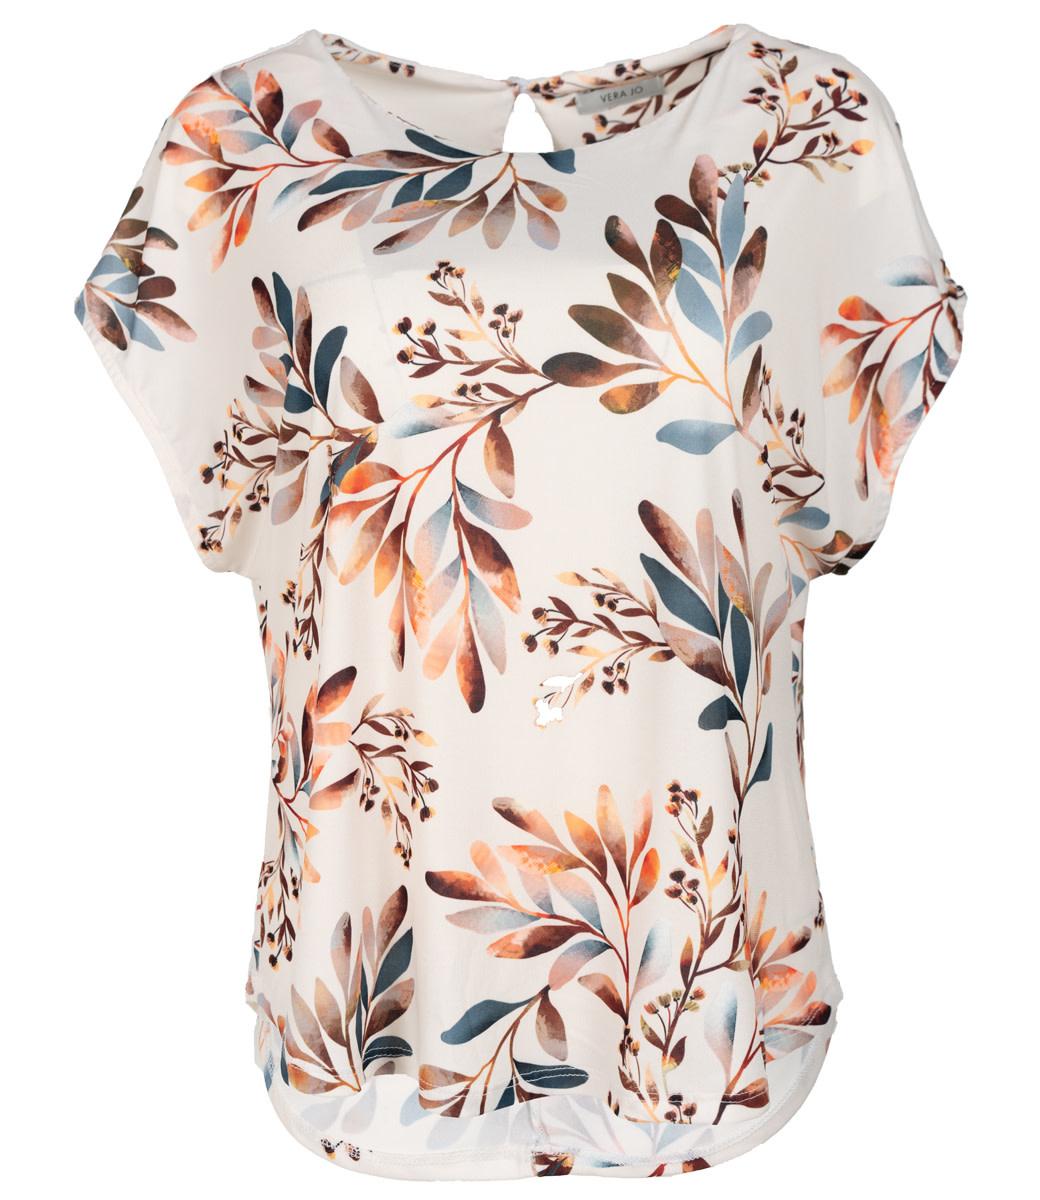 Vera Jo Shirt ecru print Do